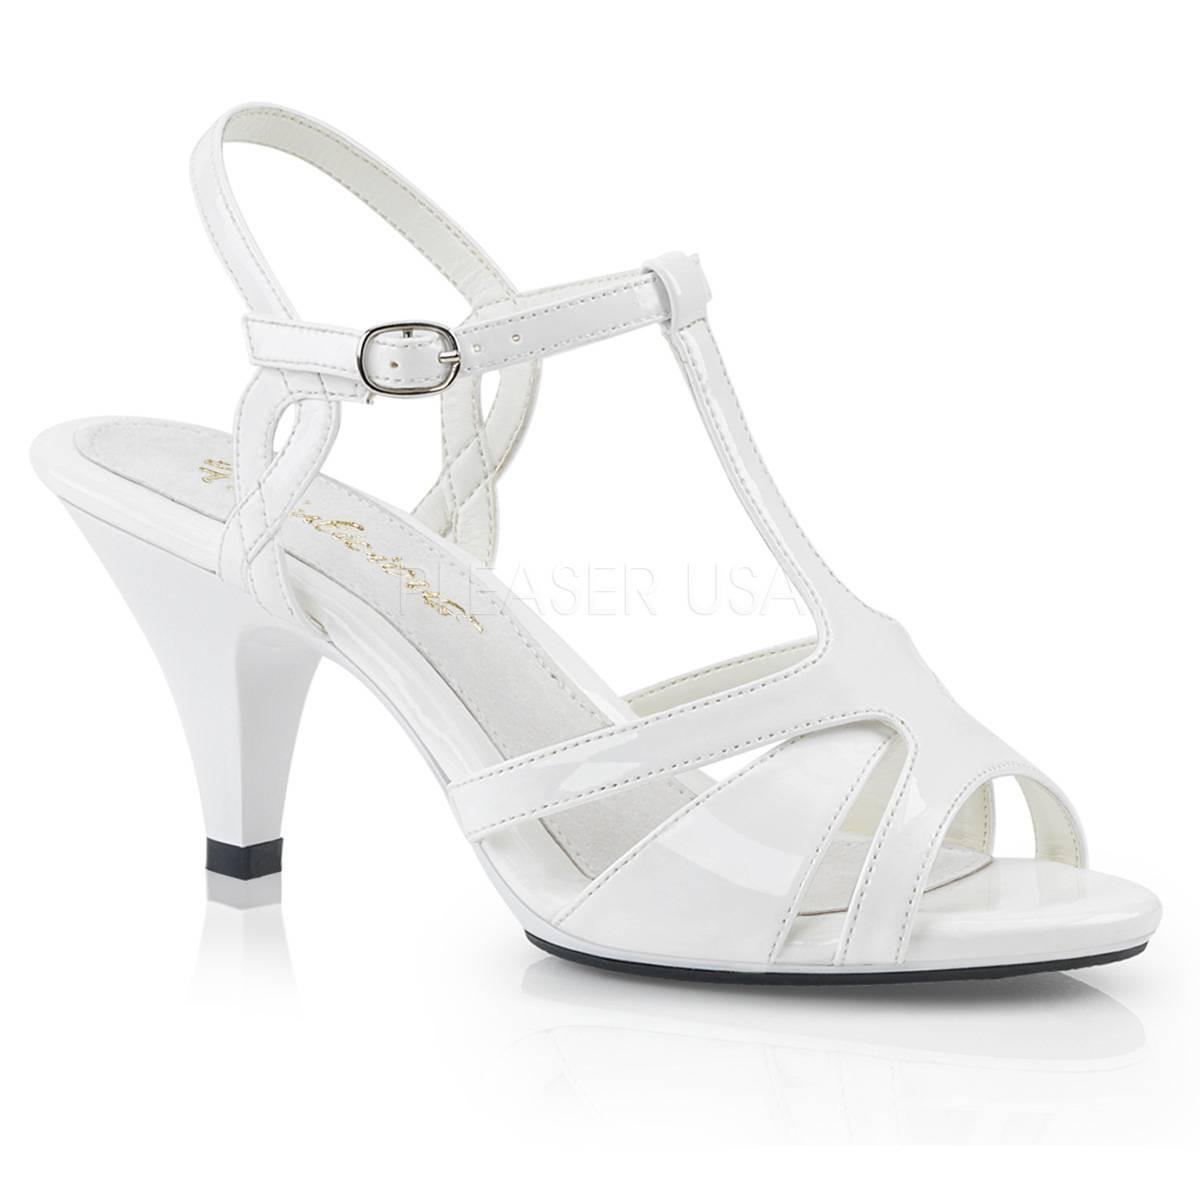 Sandalen - BELLE 322 ° Damen Sandalette ° WeißGlänzend ° Fabulicious  - Onlineshop RedSixty